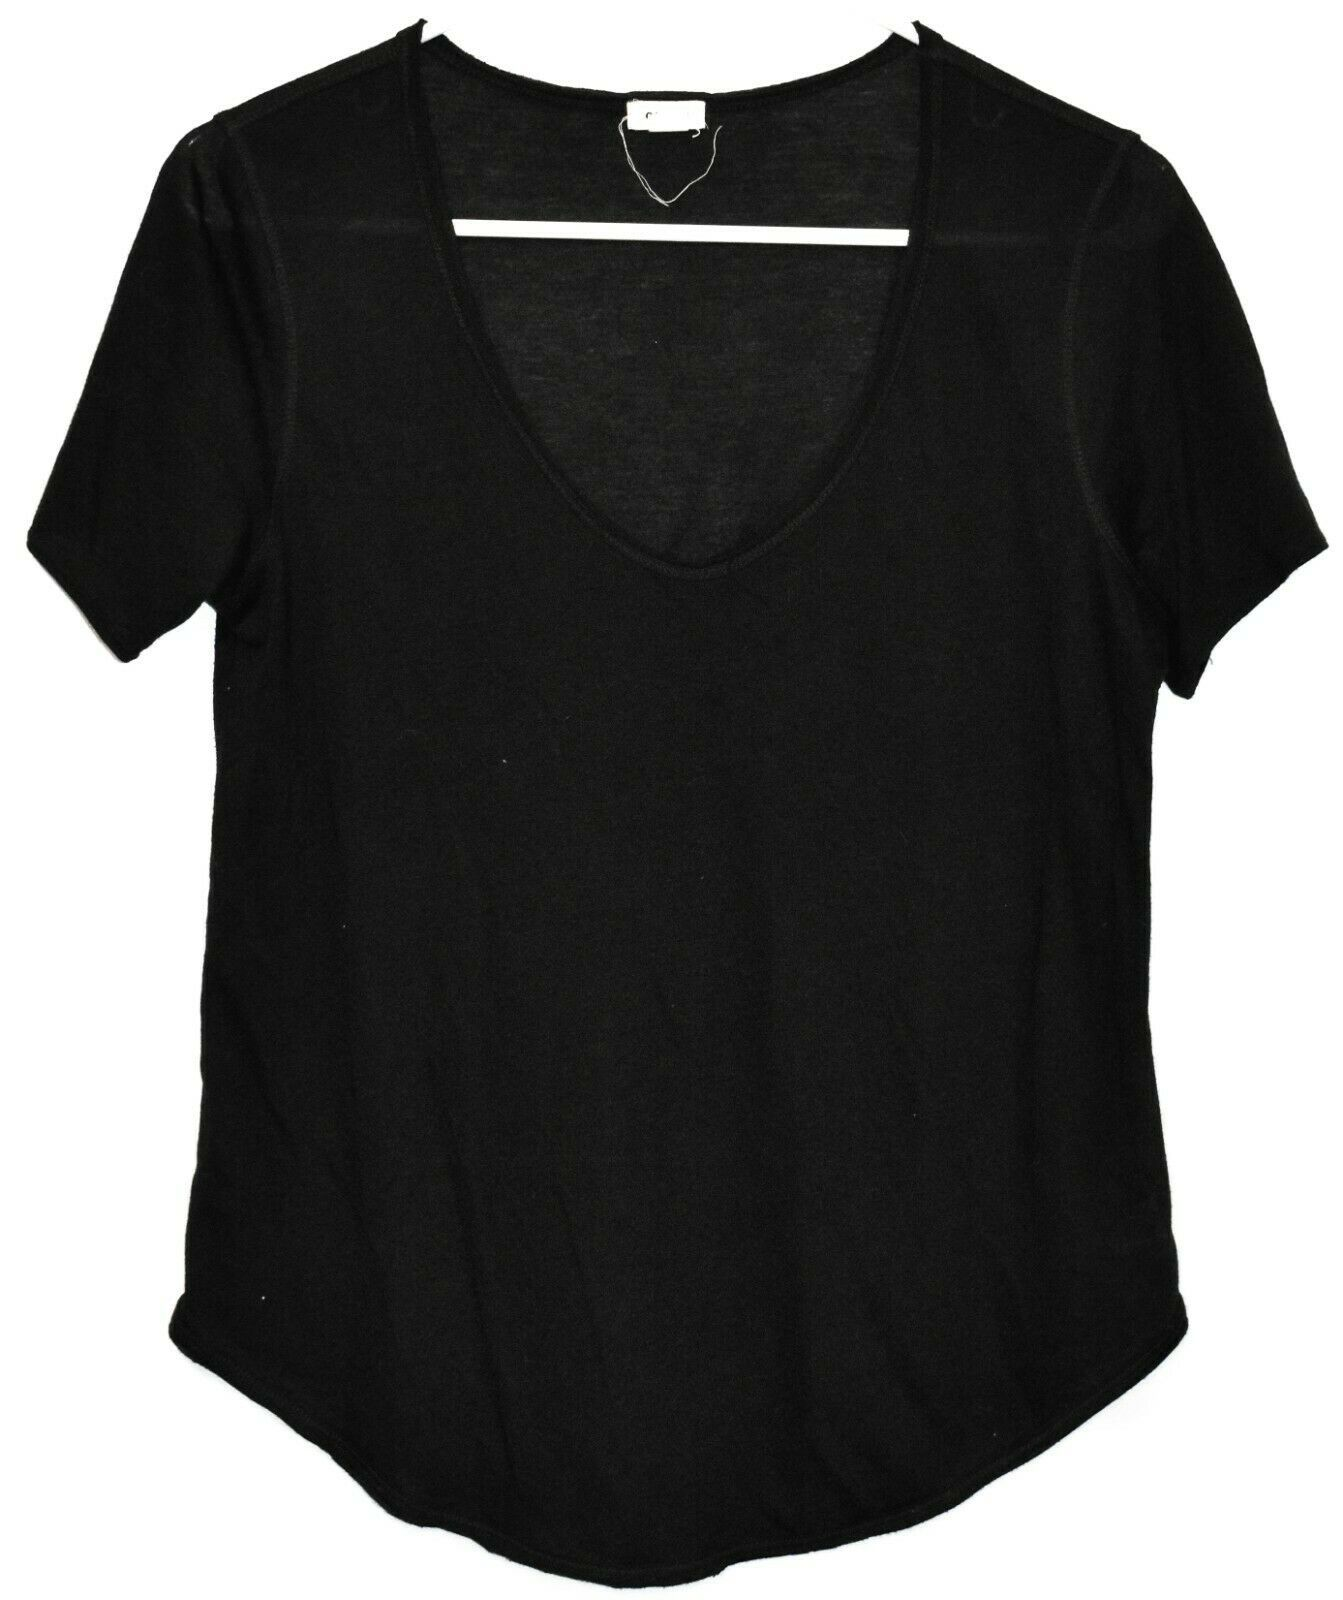 Garage Women's Sheer Black Jersey Knit Short Sleeve Shirt Size M